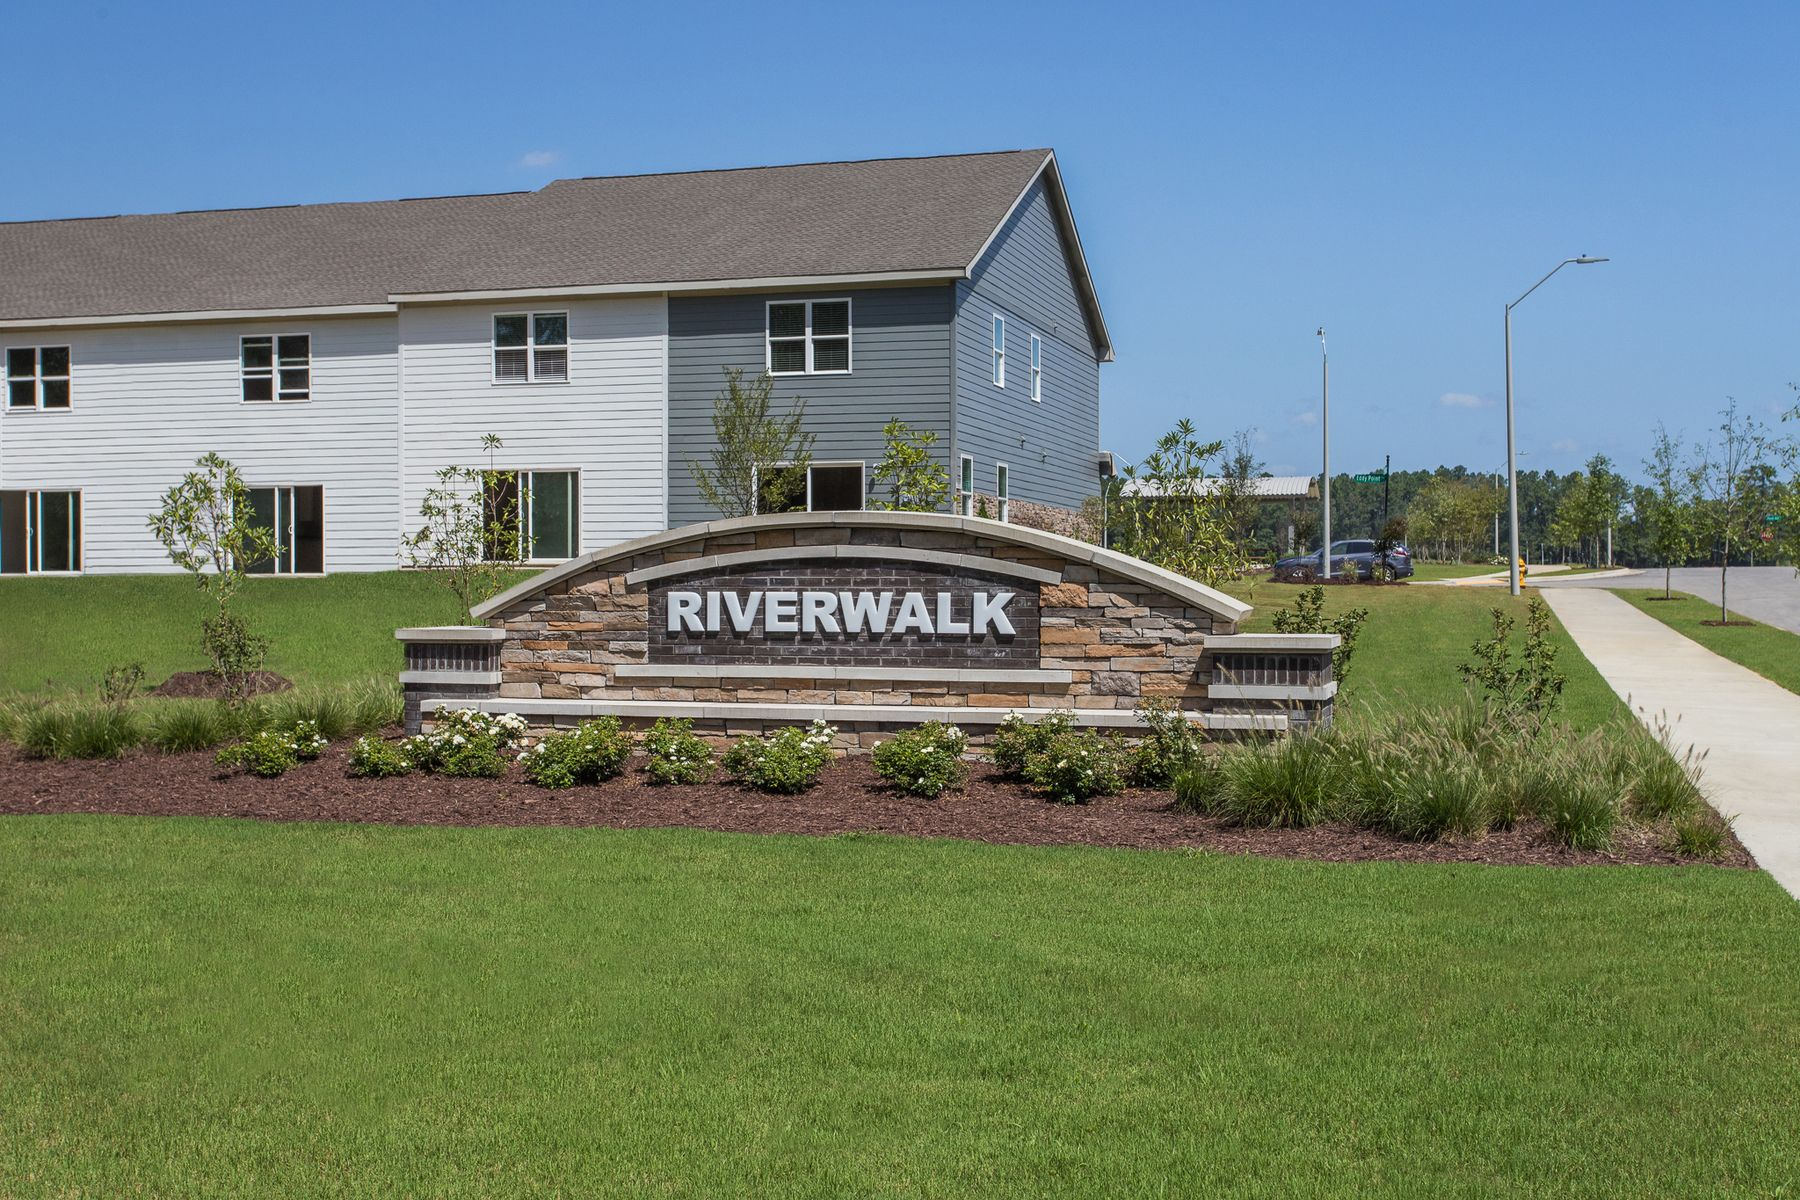 Riverwalk entrance monument